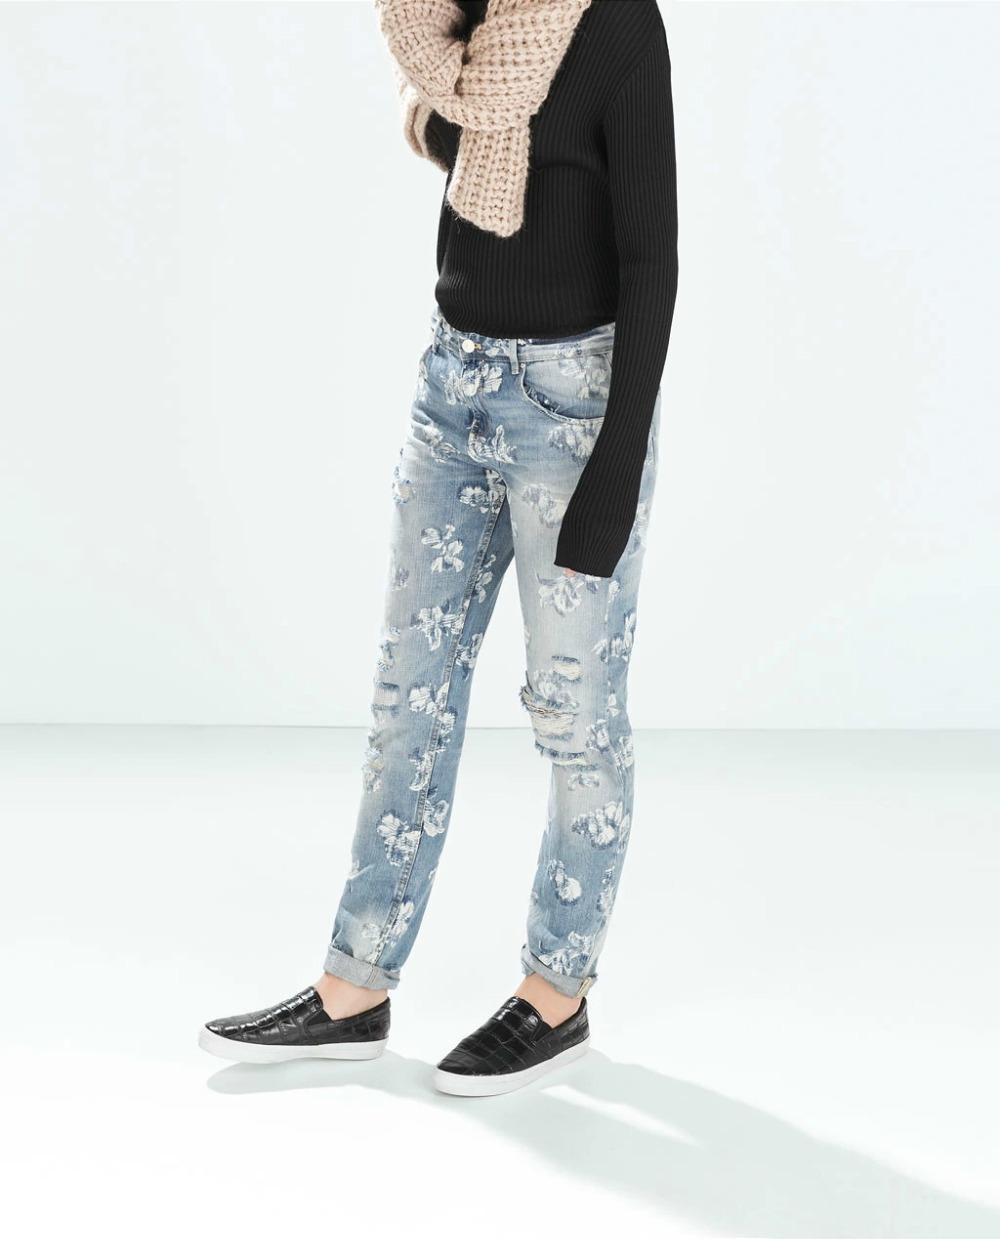 Fg12 Fashion 2015 Women Elegant Floral Print Holes Blue Denim Ripped Jeans Trouses Zipper Pockets Casual Slim Brand Skinny Pants(China (Mainland))